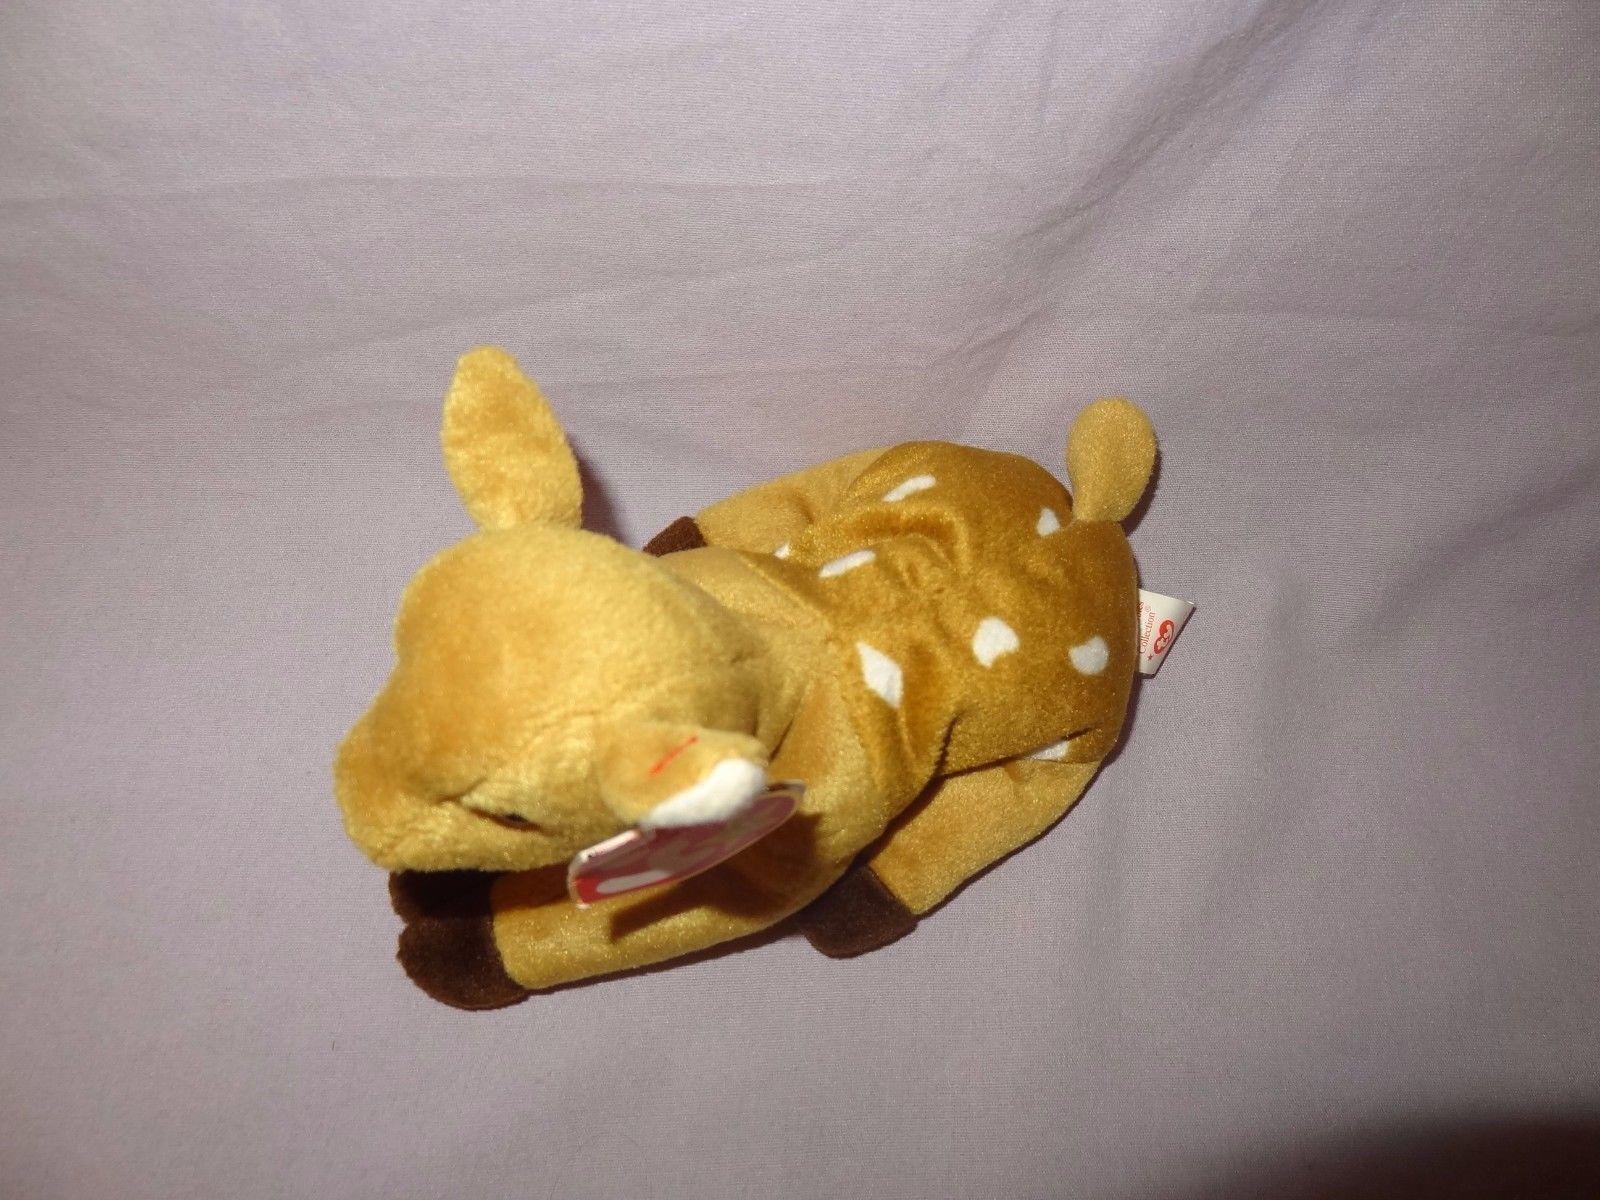 5157902cc0a Whisper Deer Fawn Ty Beanie Baby Plush Stuffed Animal Toy 1997 Tush tag  1998 4